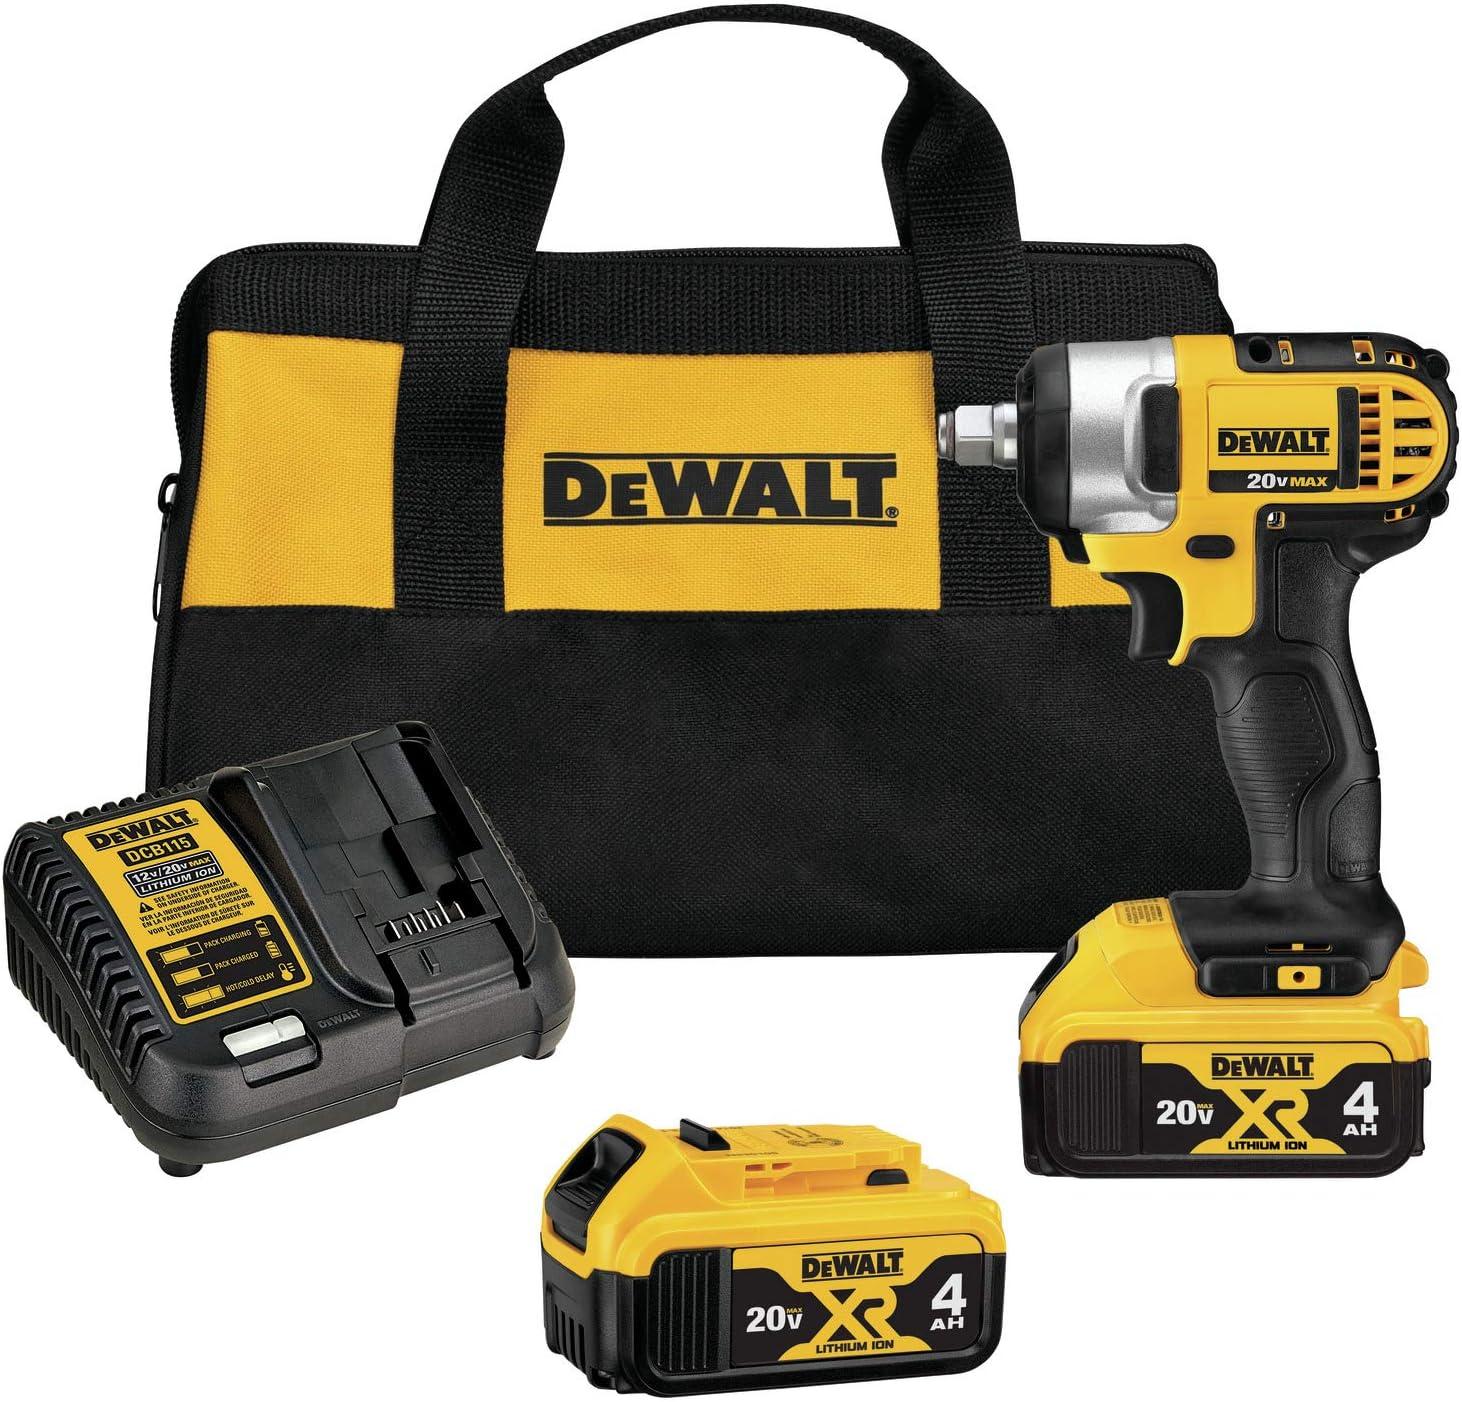 DEWALT DCF880HM2 Cordless 1/2″ Impact Wrench